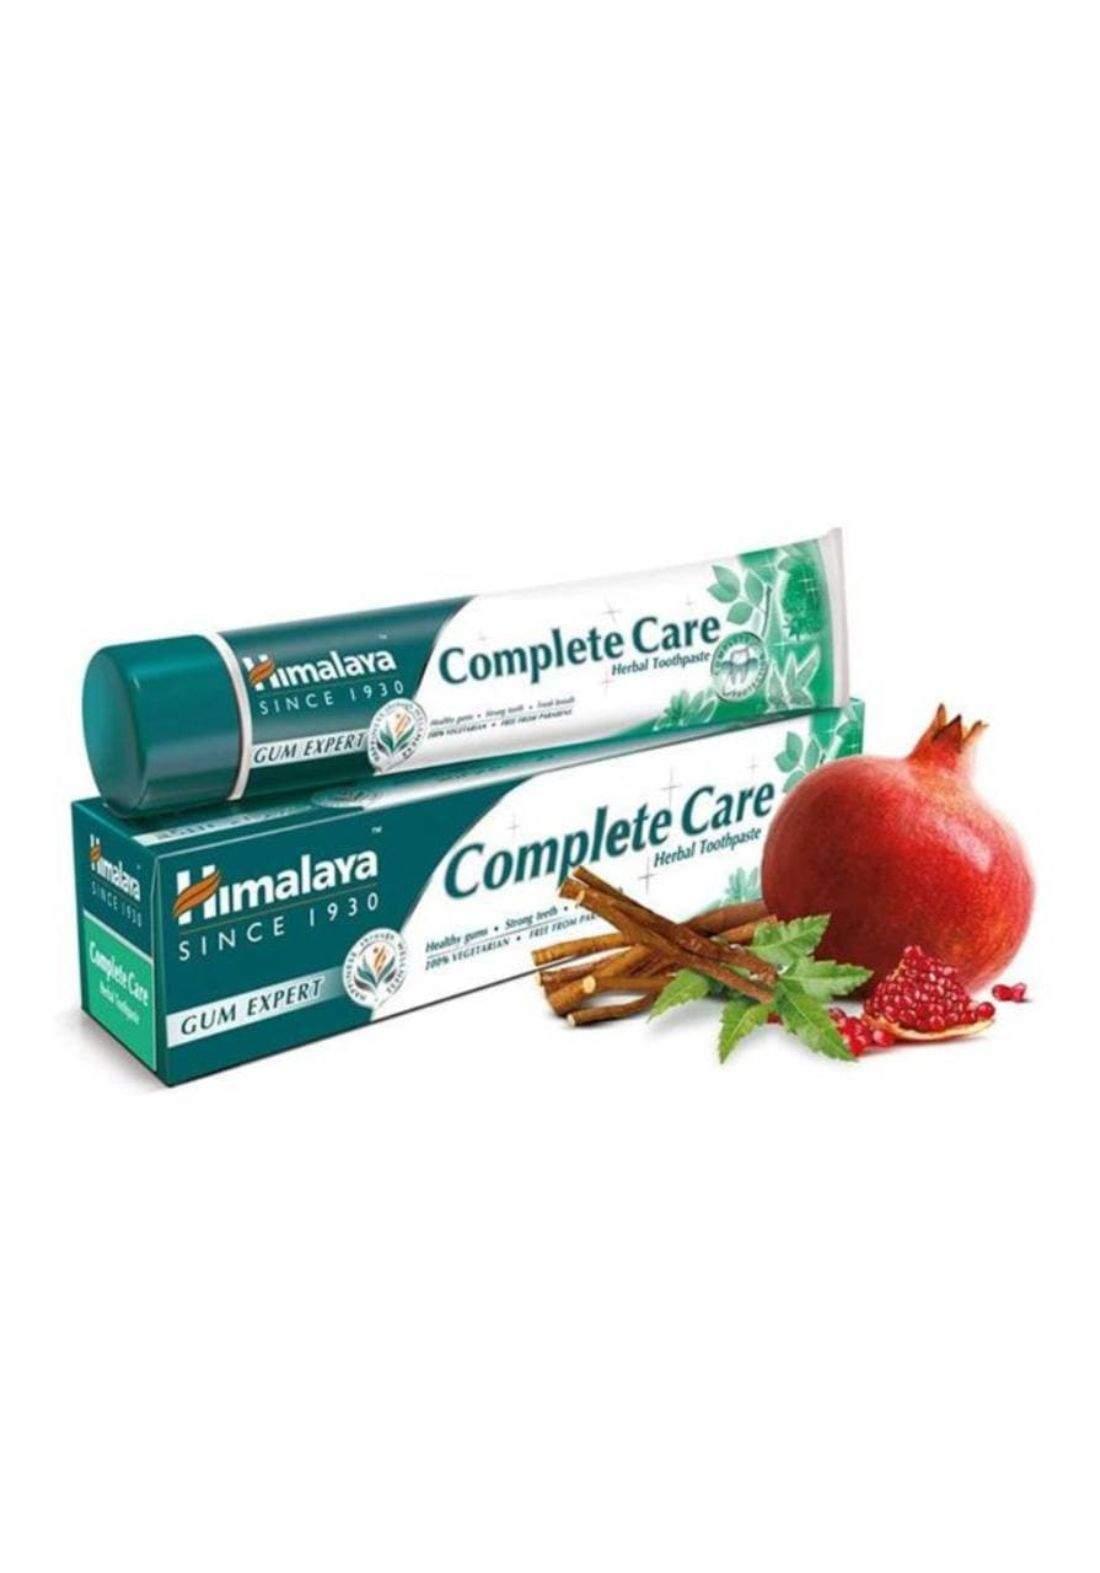 Himalaya herbal fresh tooth paste complete care 100ml معجون اسنان هيمالايا لعناية كاملة